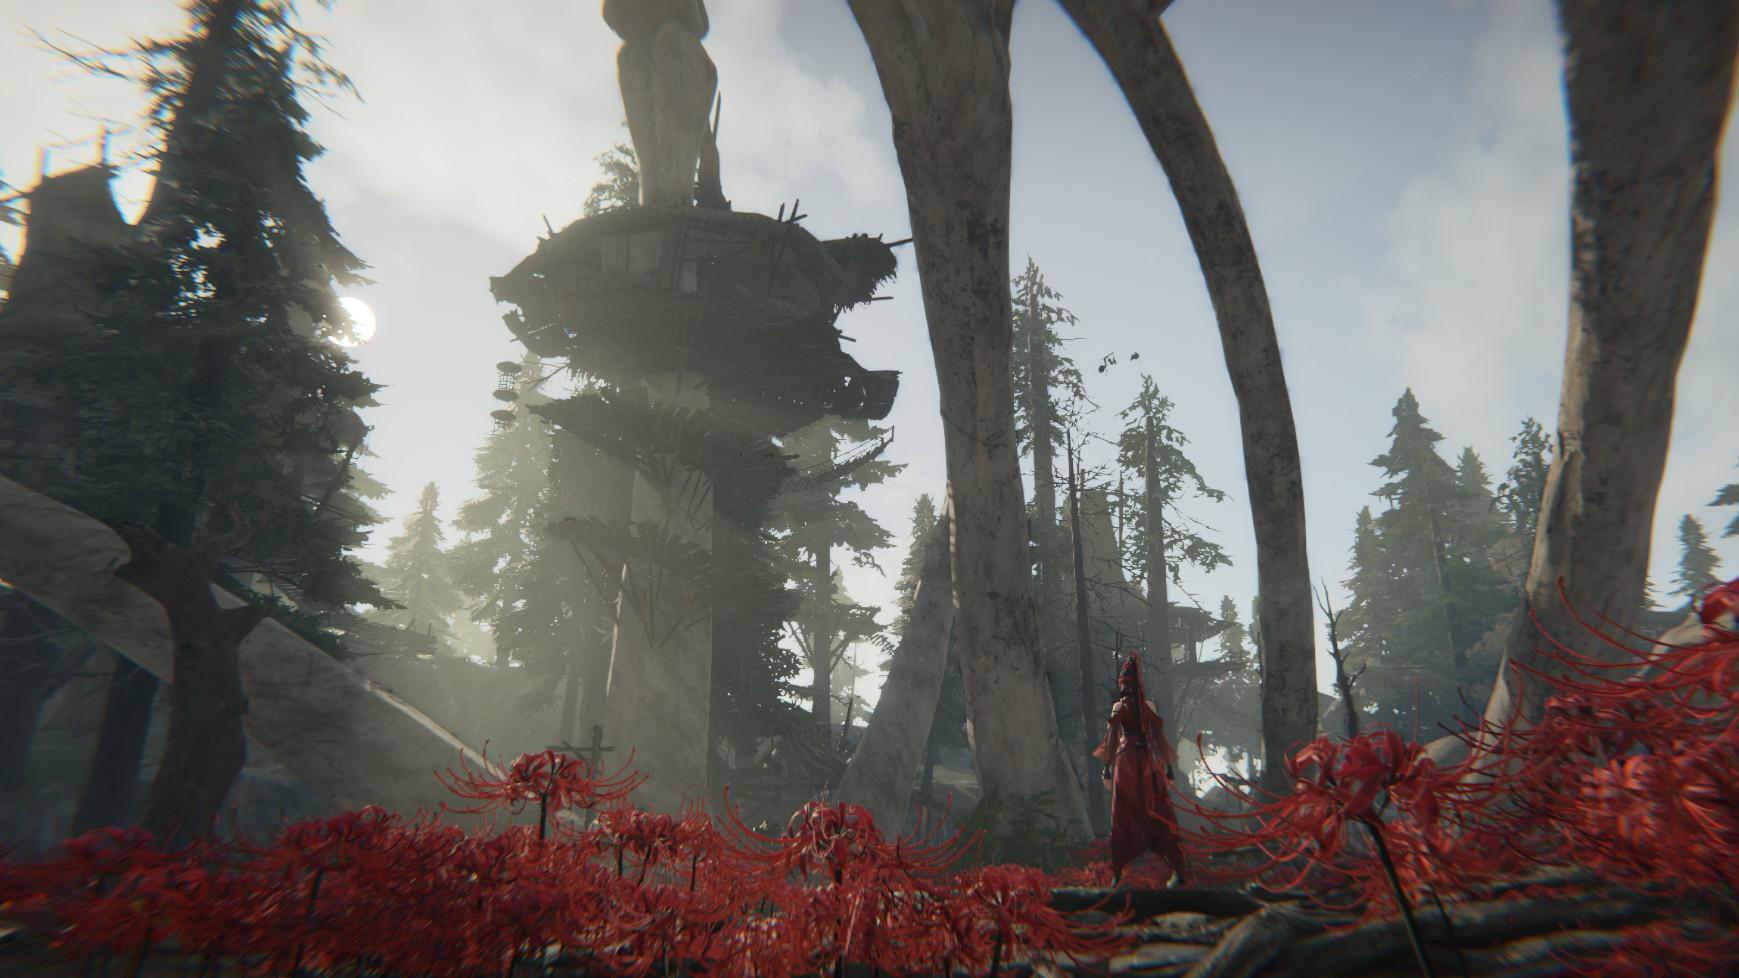 Naraka: Bladepoint launches, immediately reaches Steam's top ten